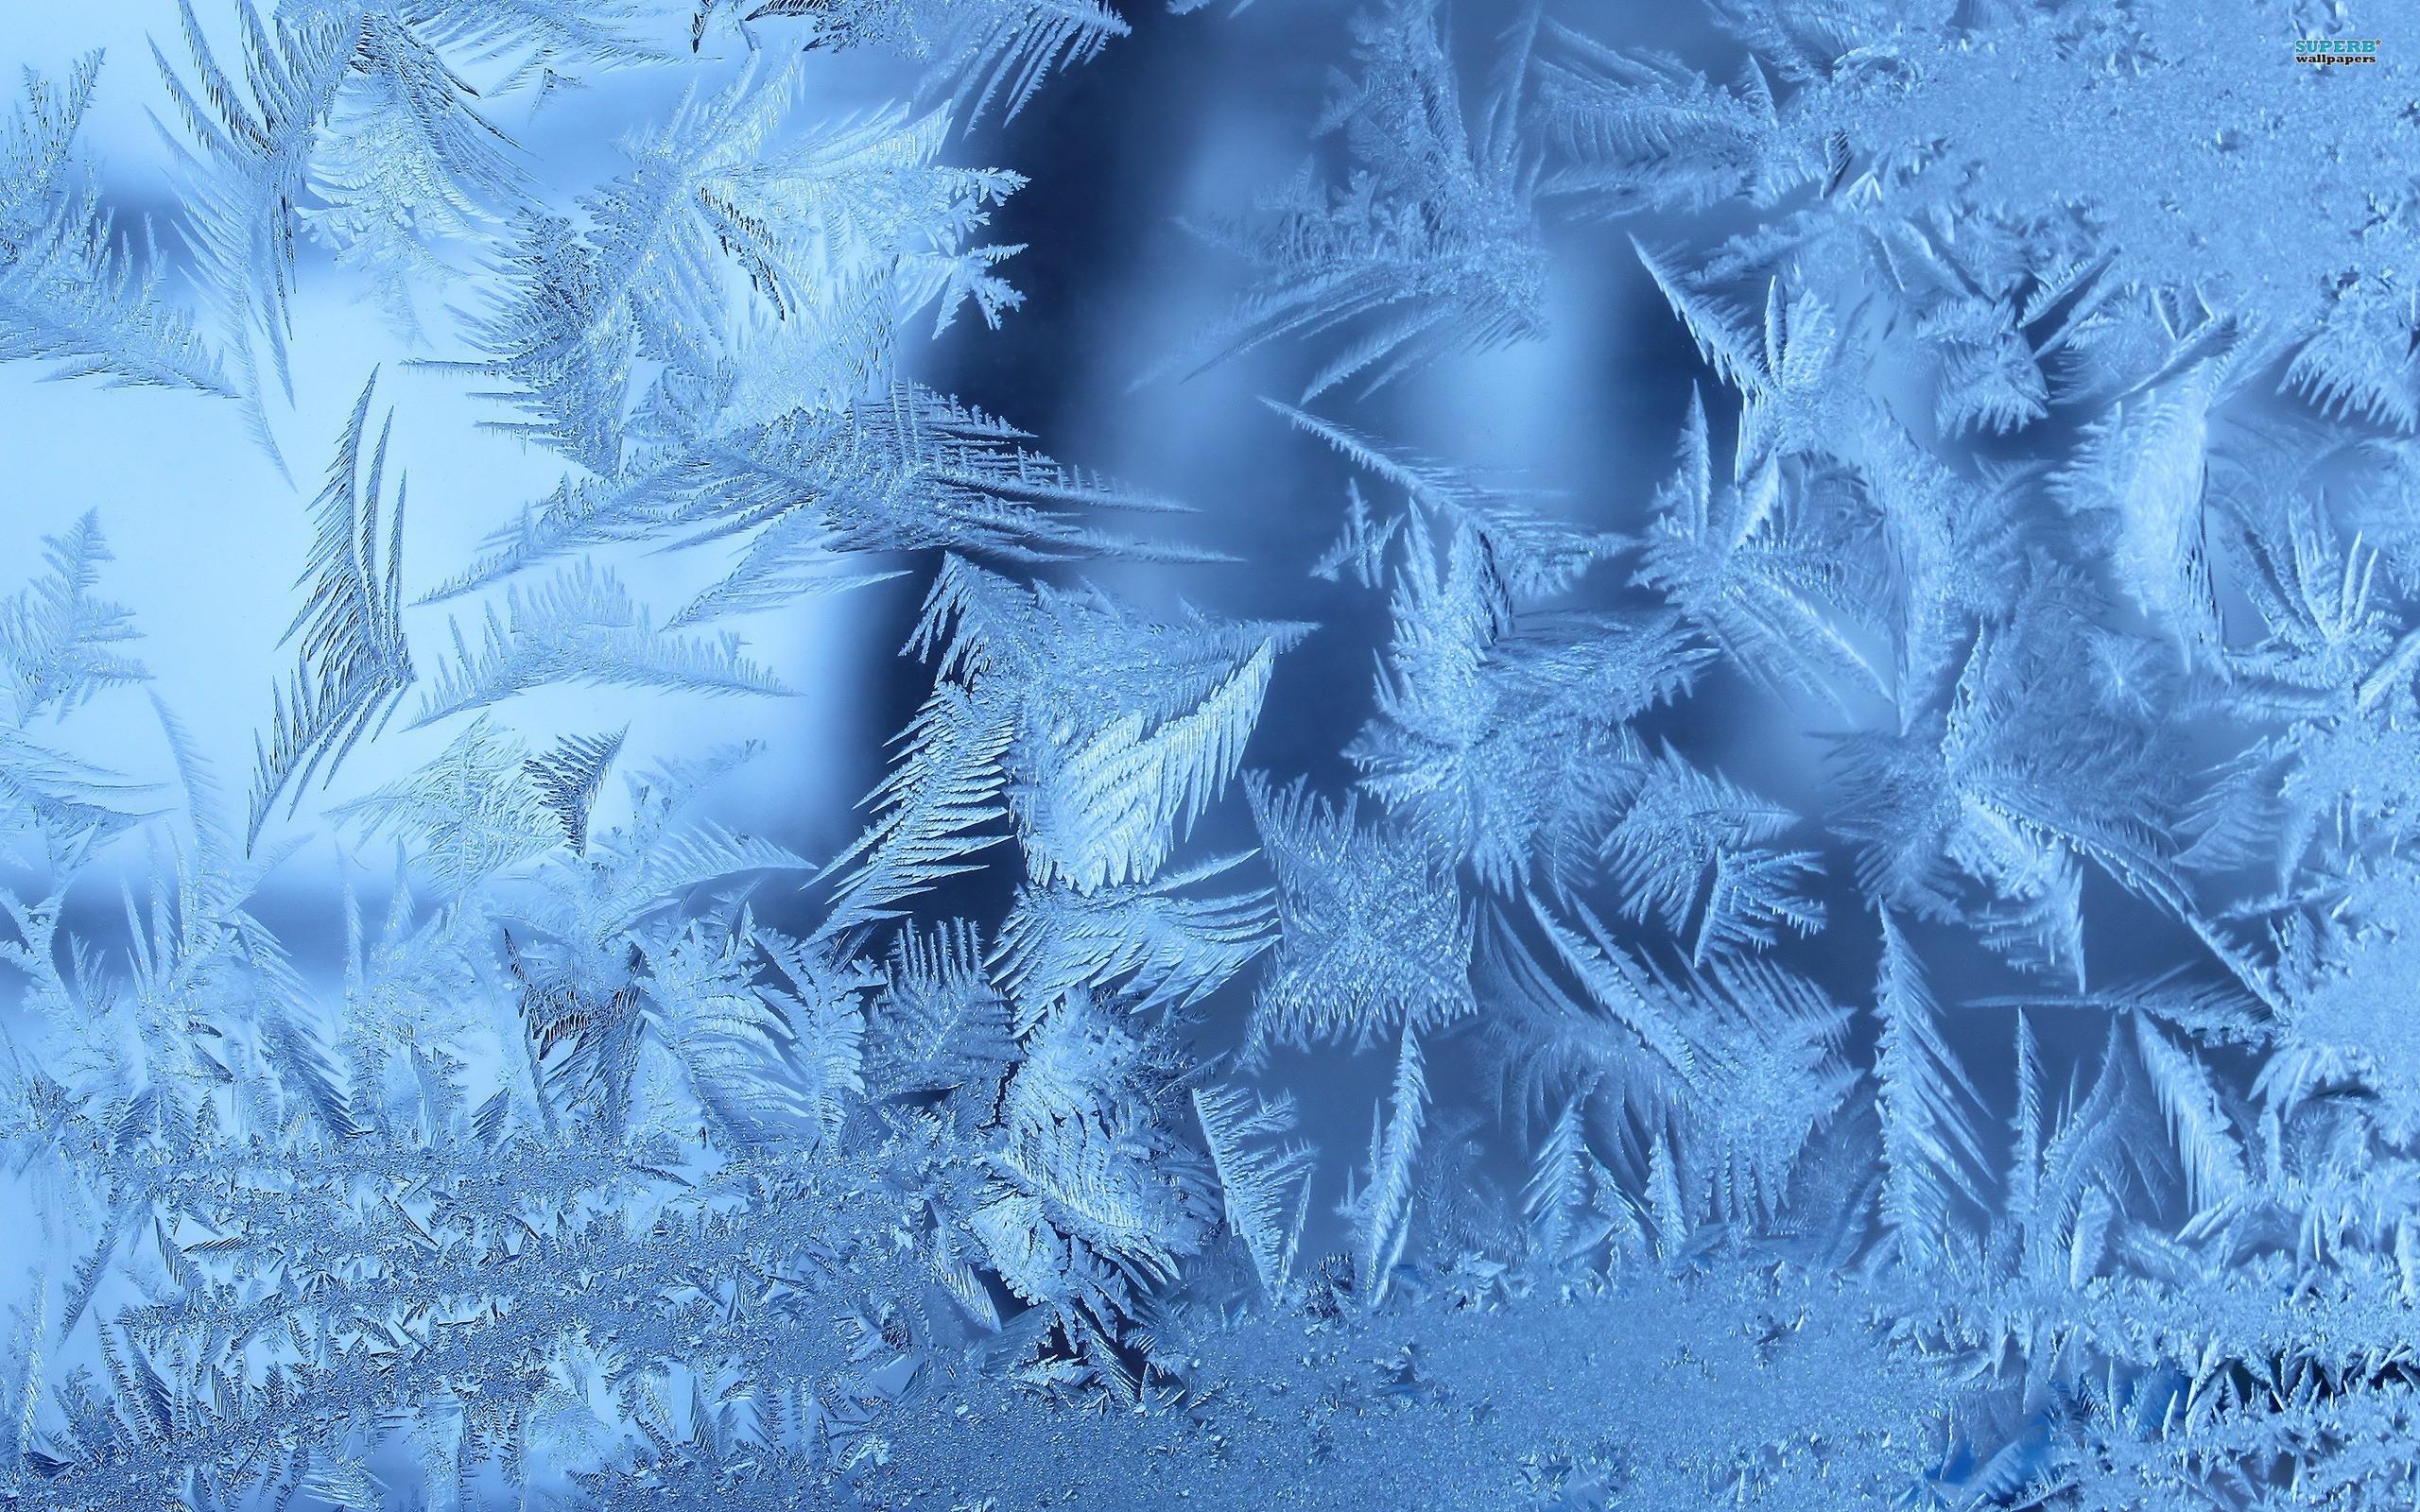 HD Ice Wallpaper - WallpaperSafari Wallpaper Hd